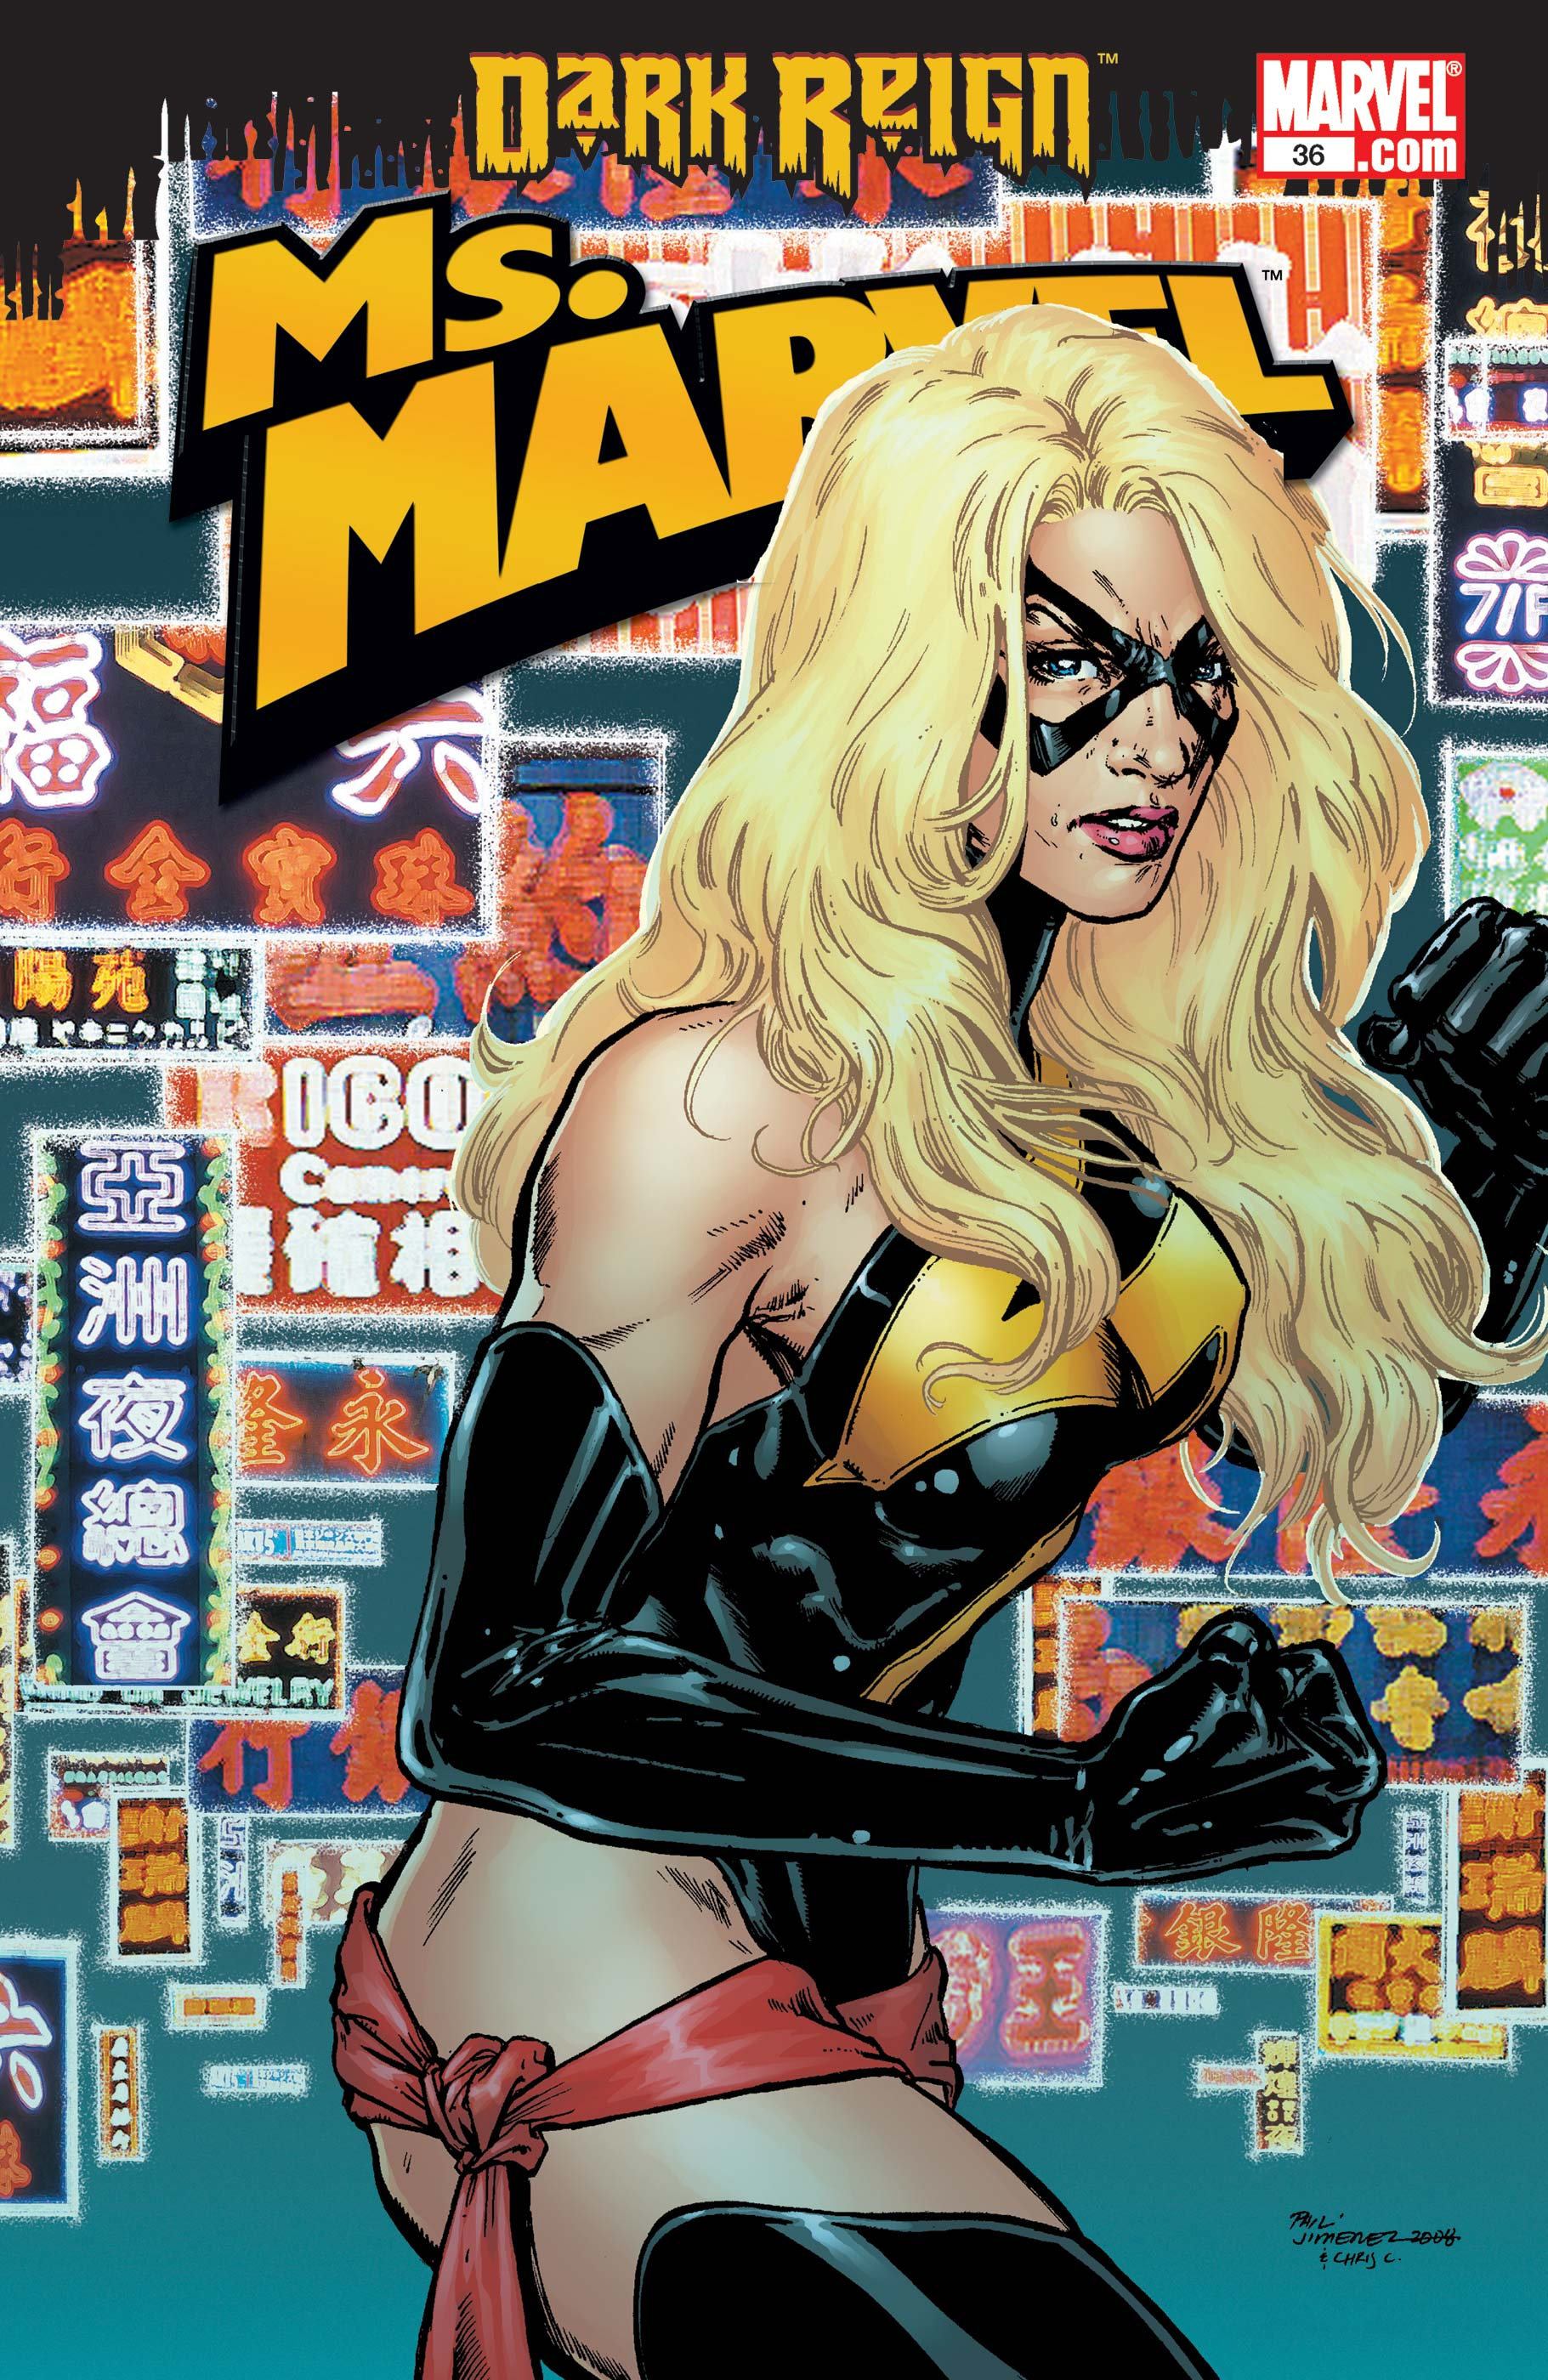 Ms. Marvel (2006) #36